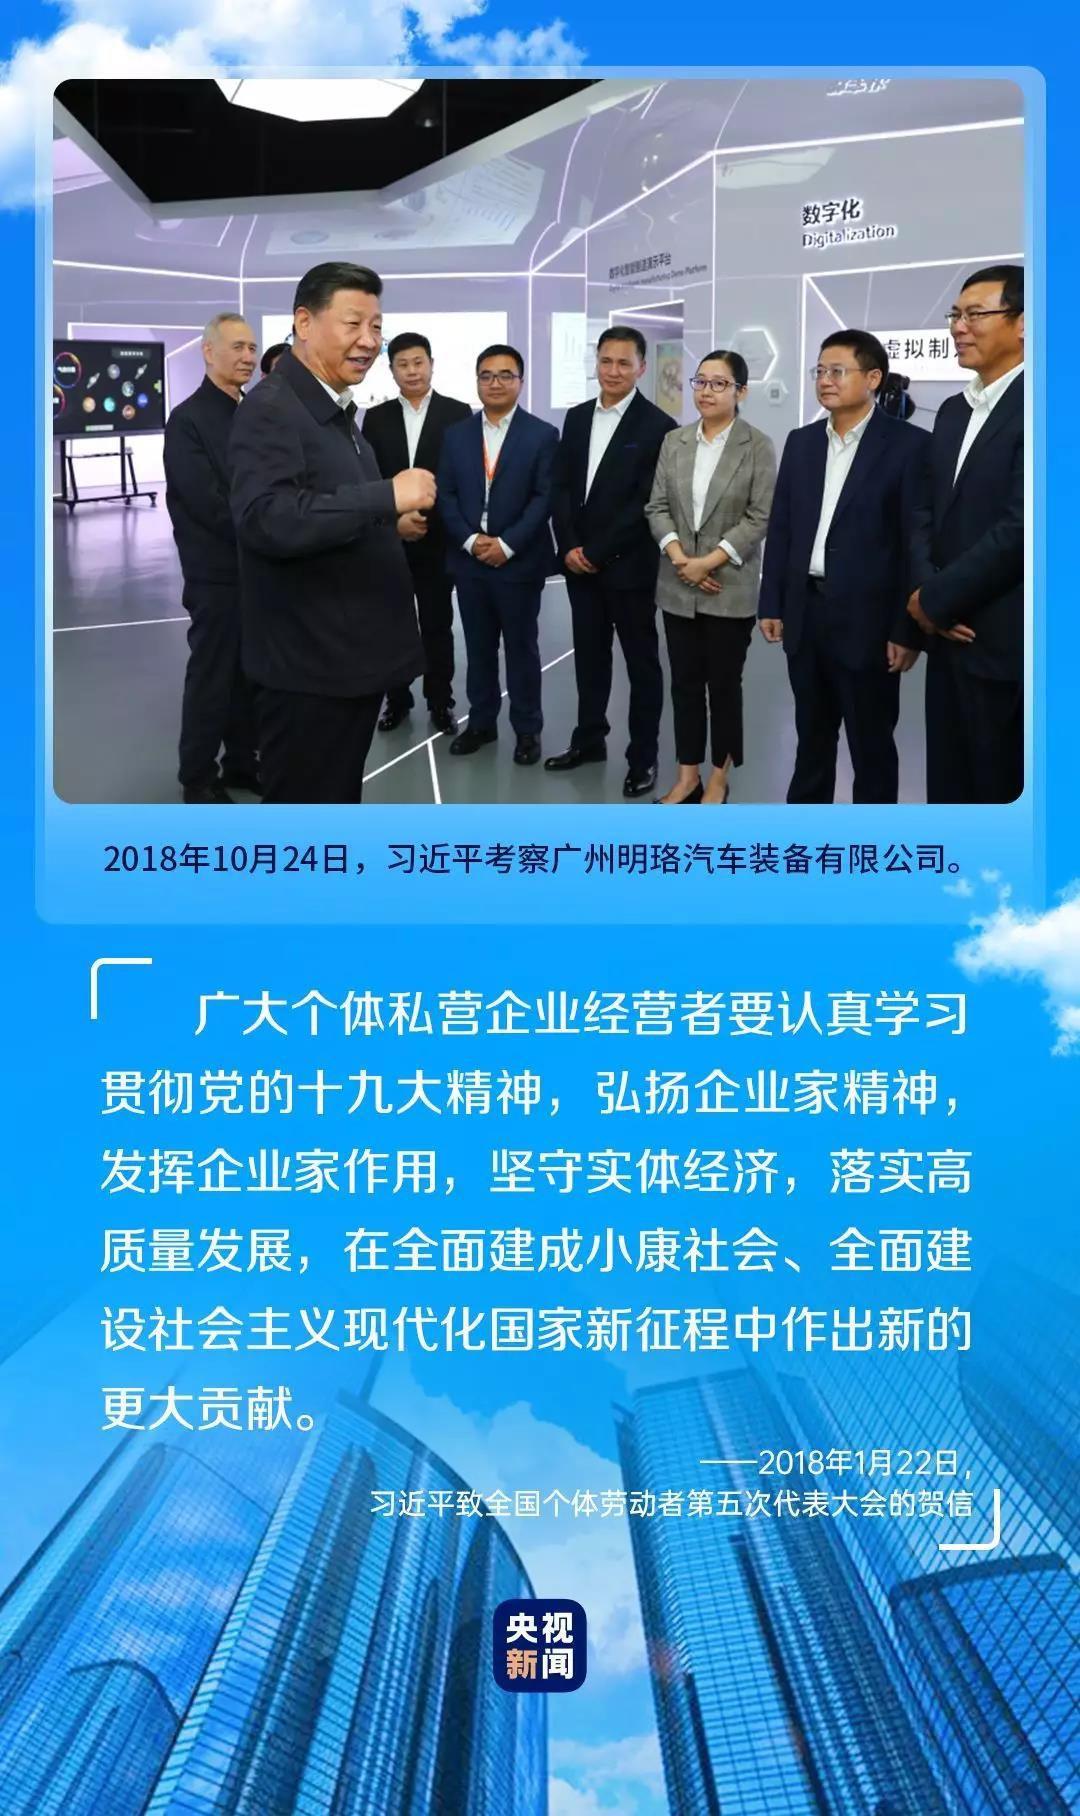 http://www.byrental.cn/jiankang/172847.html